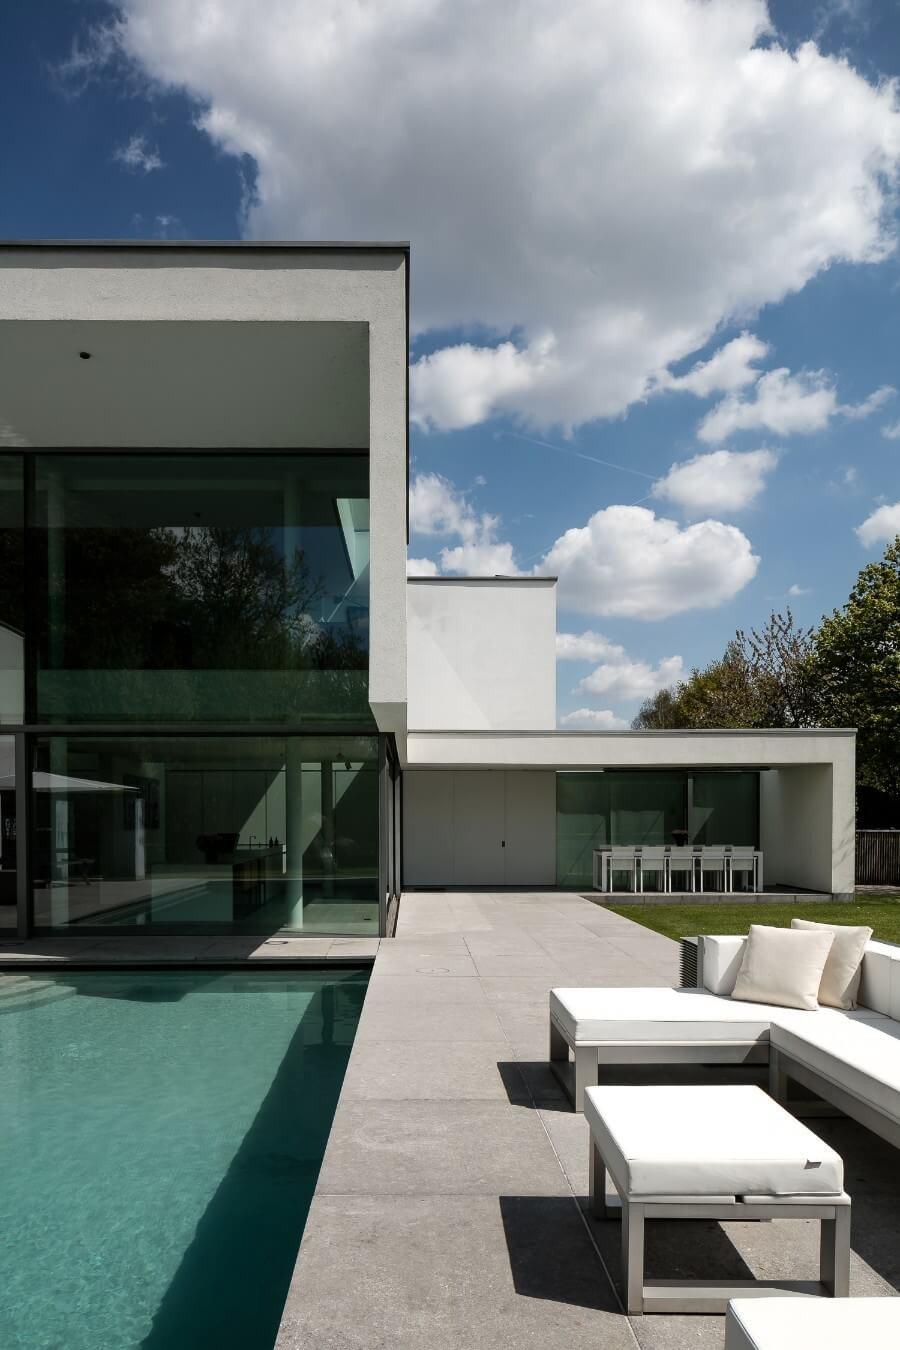 House-MP-Rietveldprojects-Photobycafeine-21